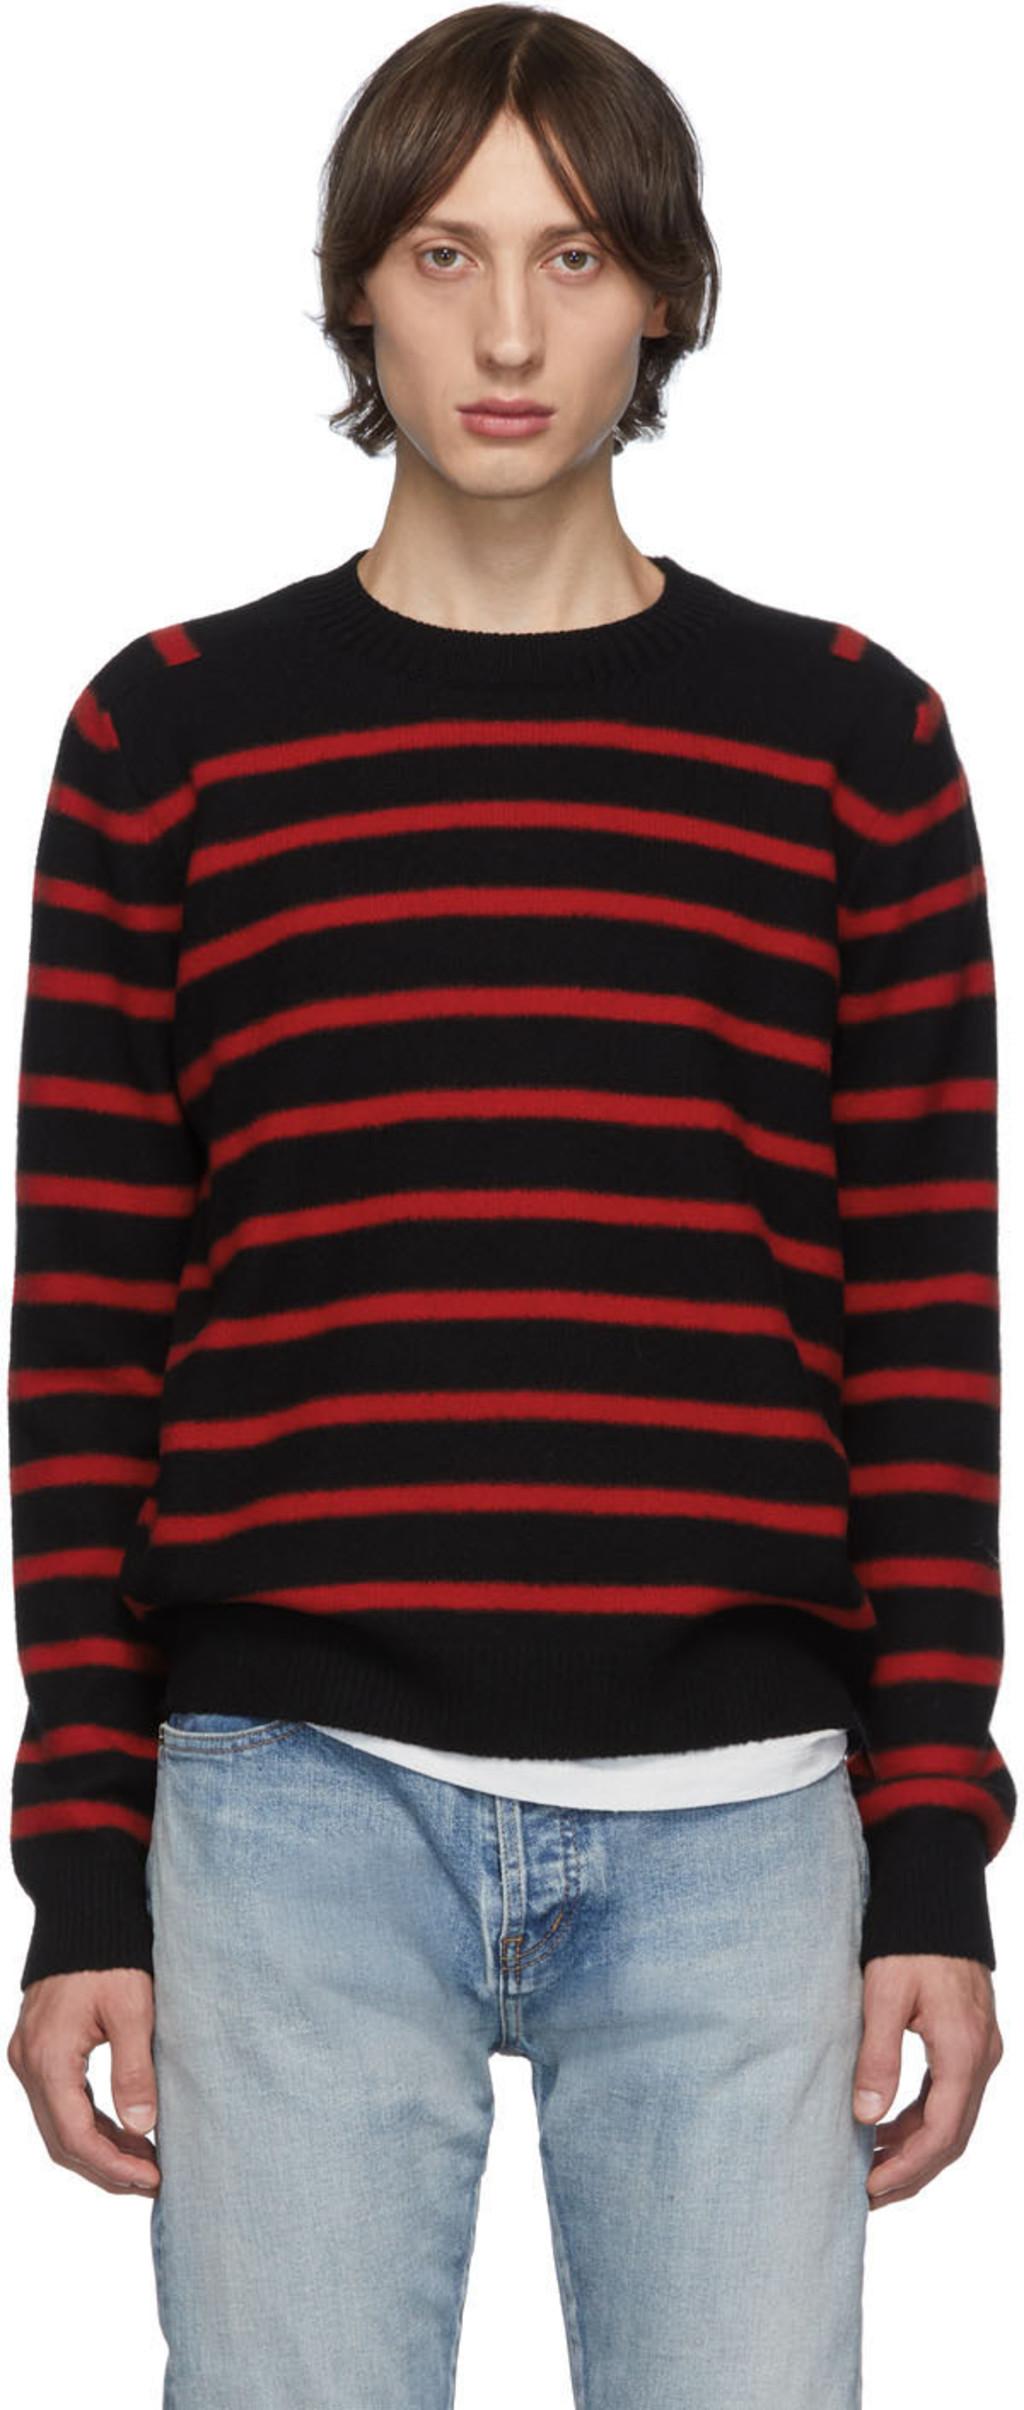 440fd0d5e5 Black & Red Striped Sweater